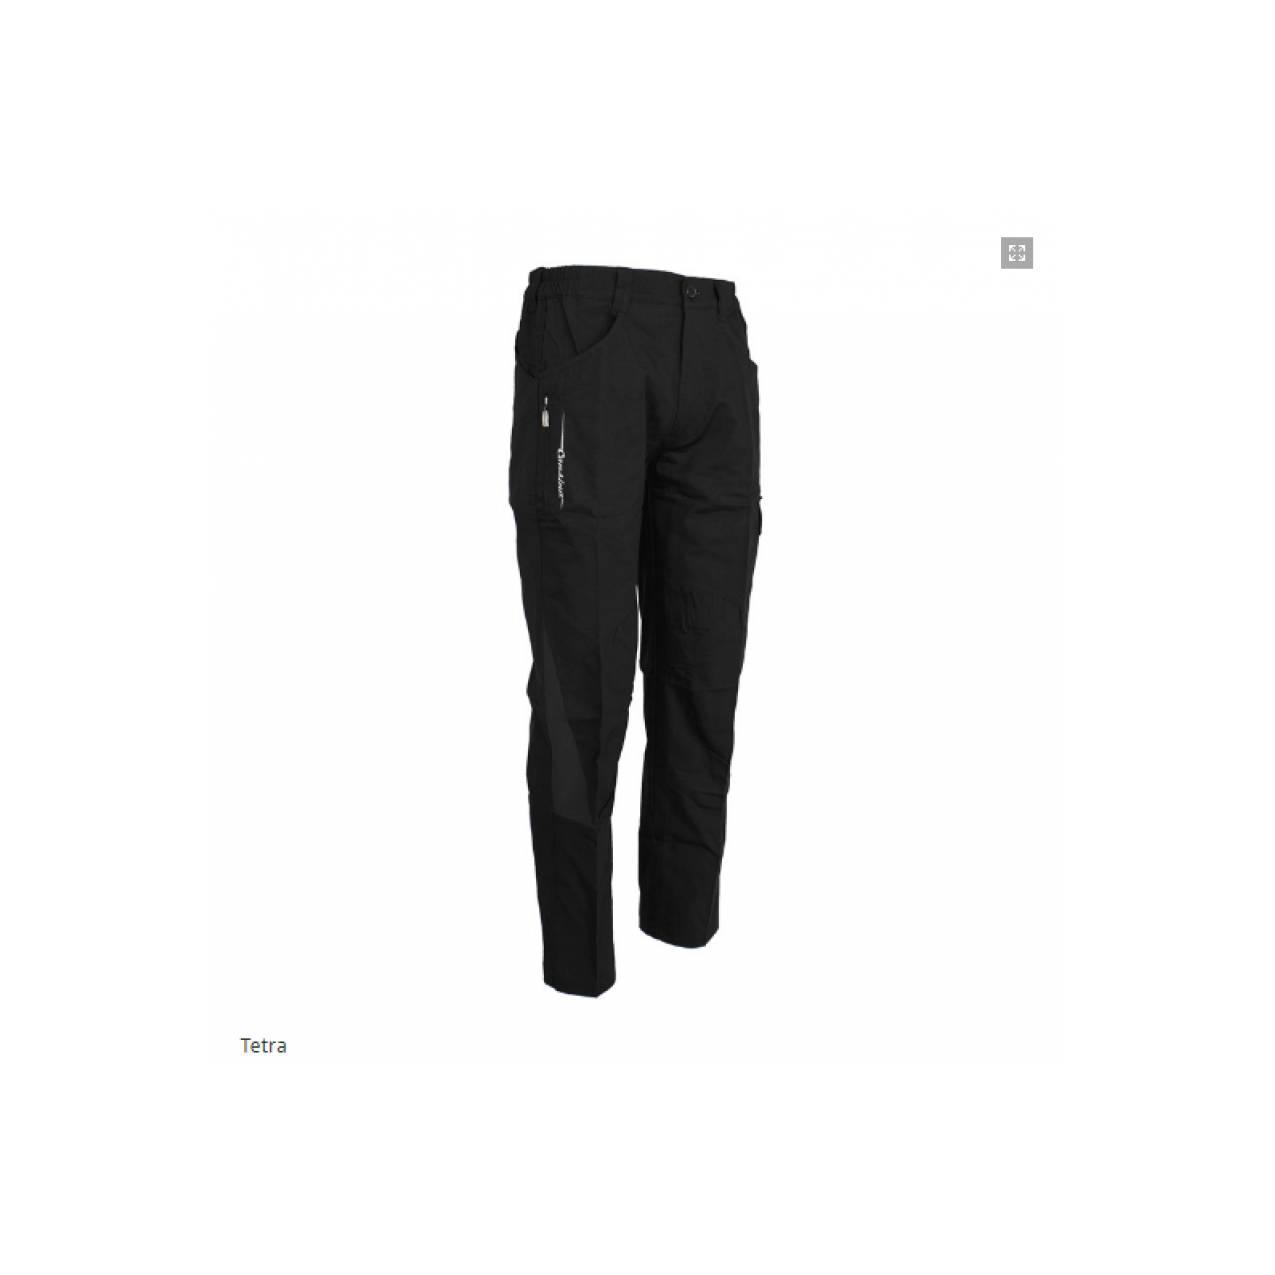 Celana Panjang Consina Pinnacle Tabiea Pro Stretch Quickdry Ultralight Long Pant Original Not Eiger Rei Berghaus The North Face Mammut Wa